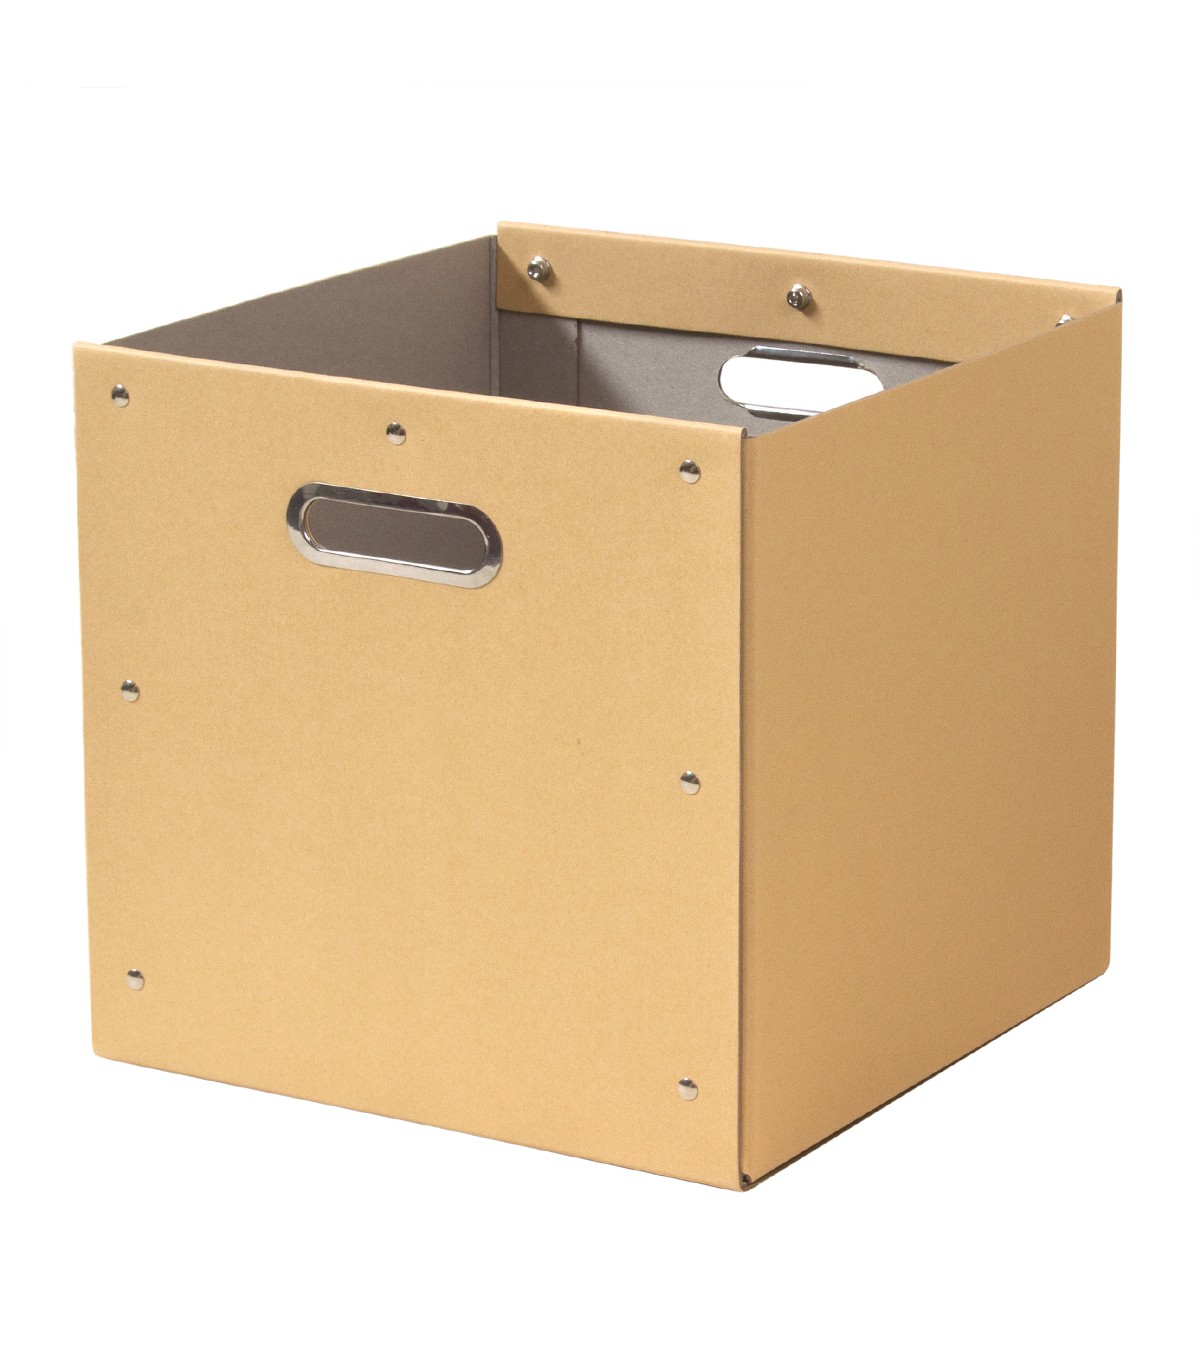 Cube de rangement en kraft finition métal - 28x28x27cm - Beige